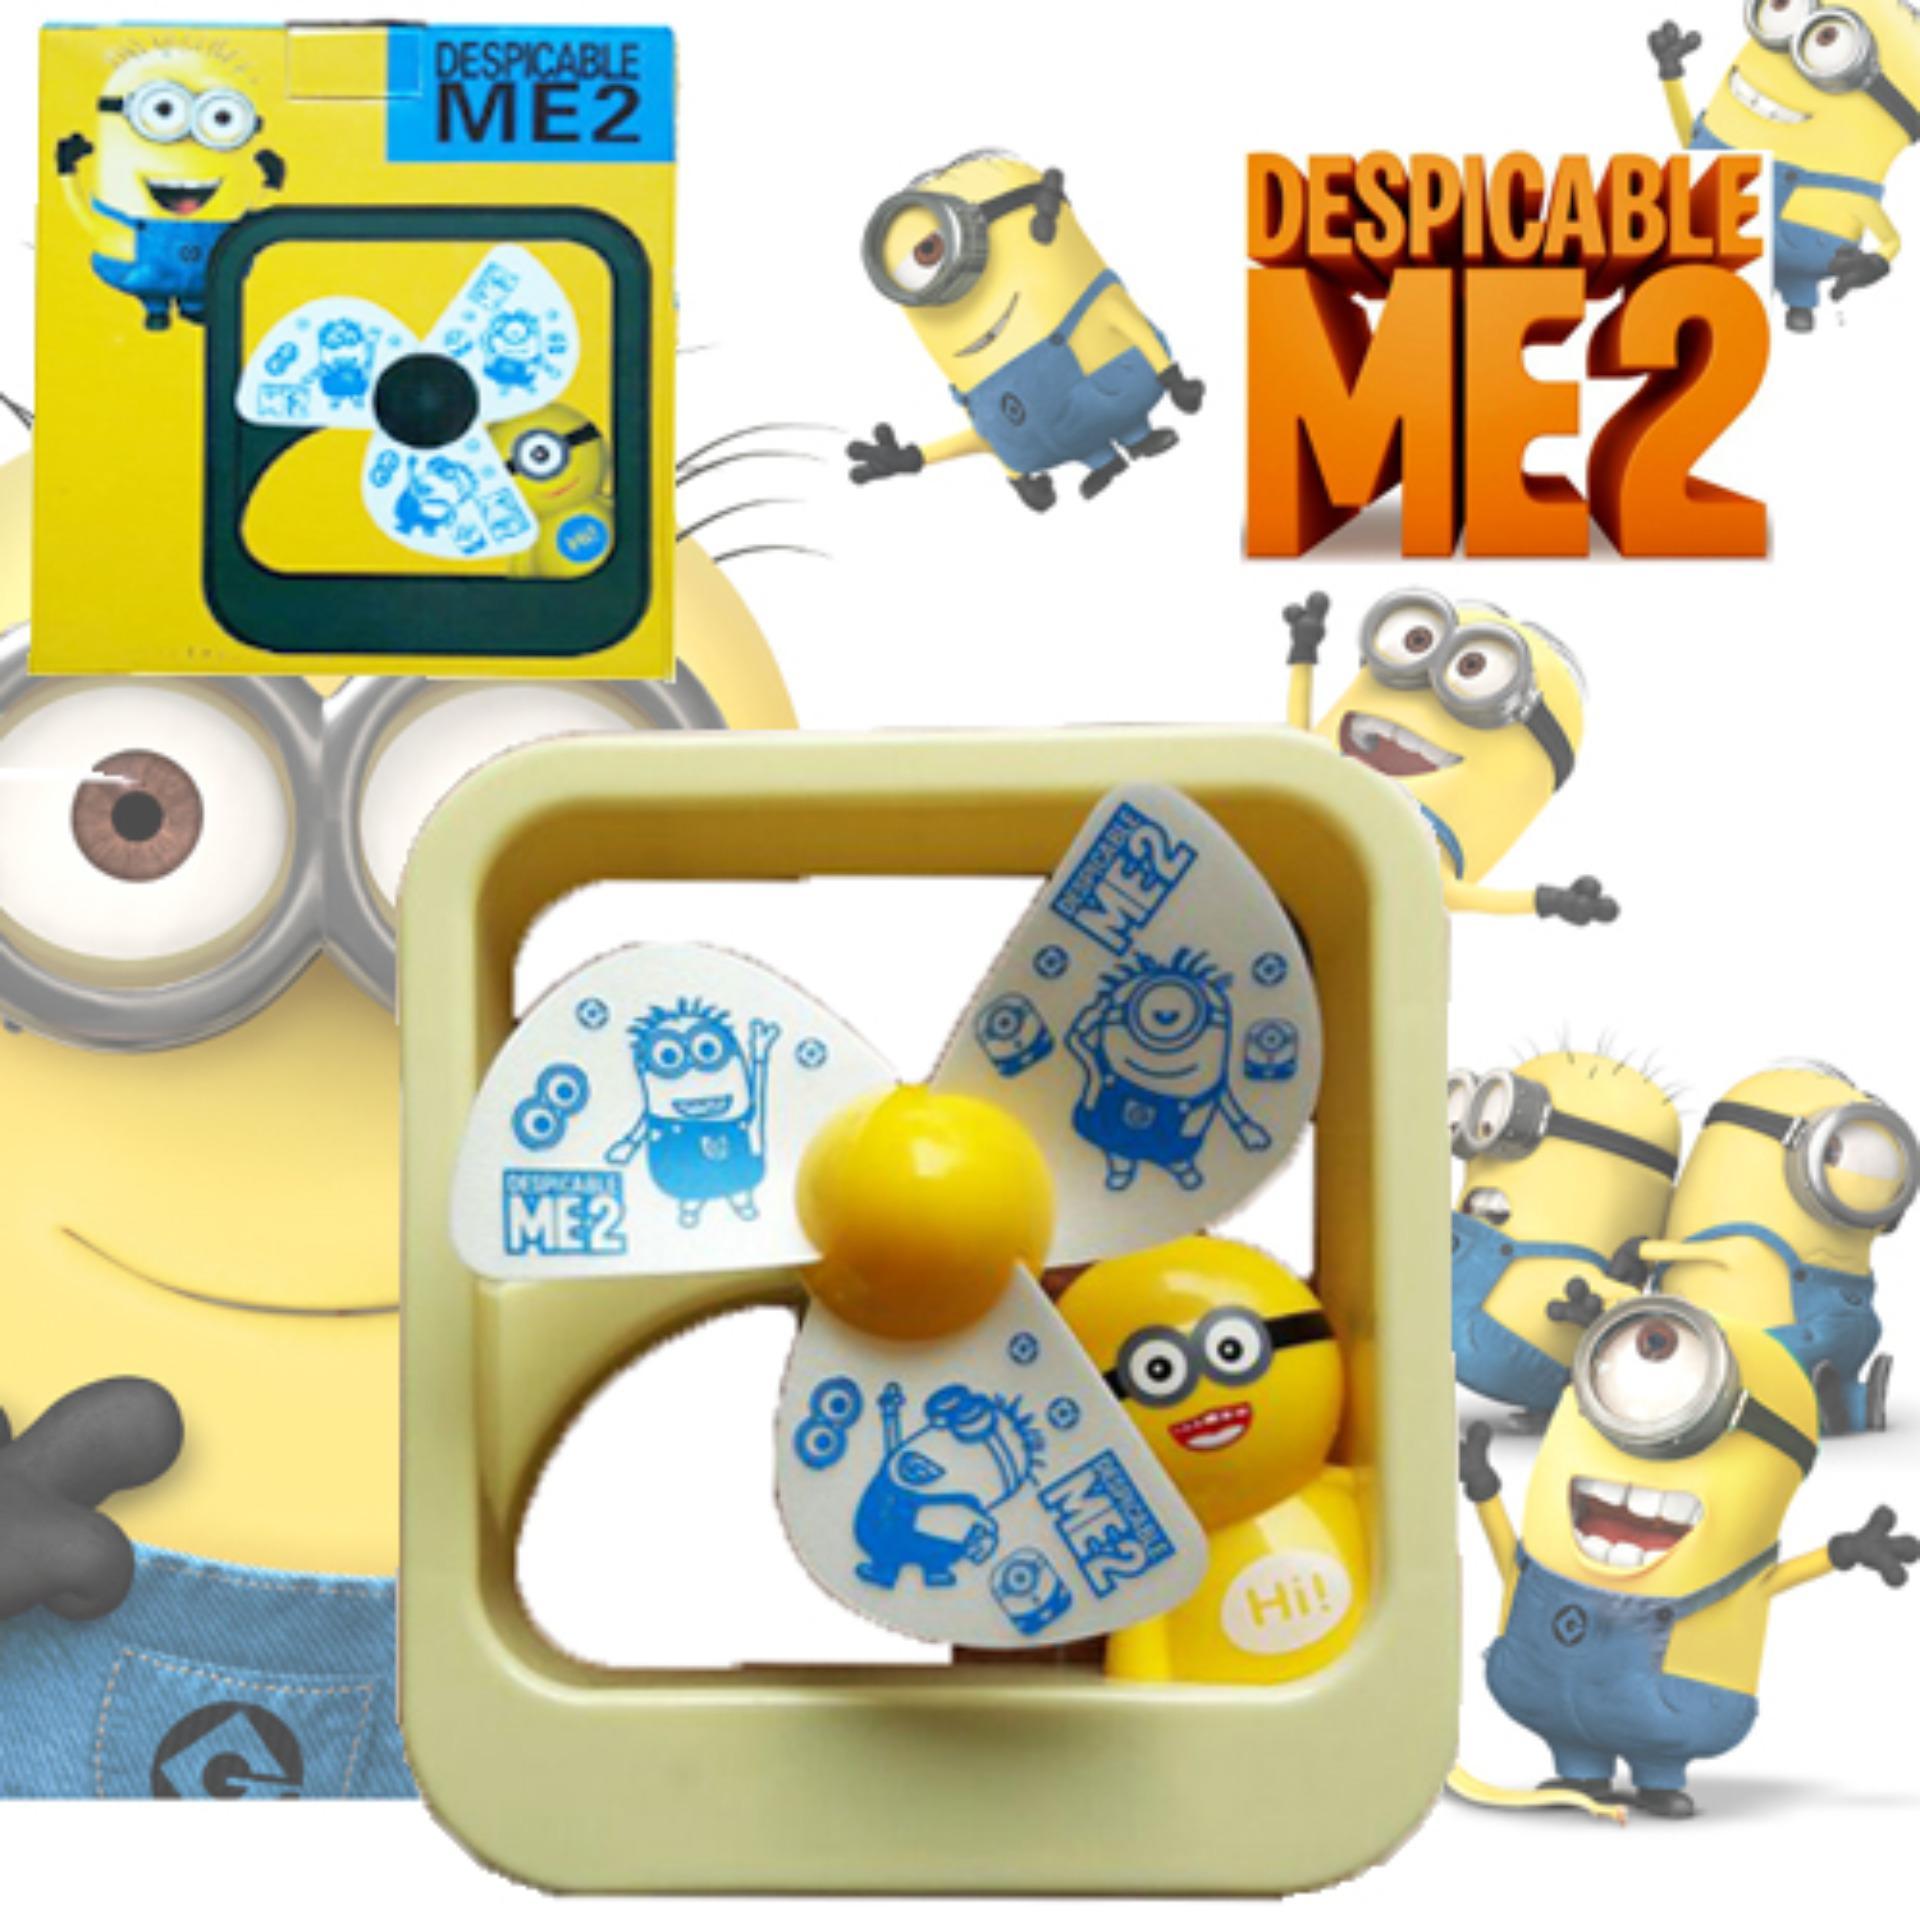 Pencarian Termurah Top Grade Aa Kipas Angin Usb Mini Karakter 13cm Flash Sale Rechargeable Minionbaymax Hello Kitty Doraemon